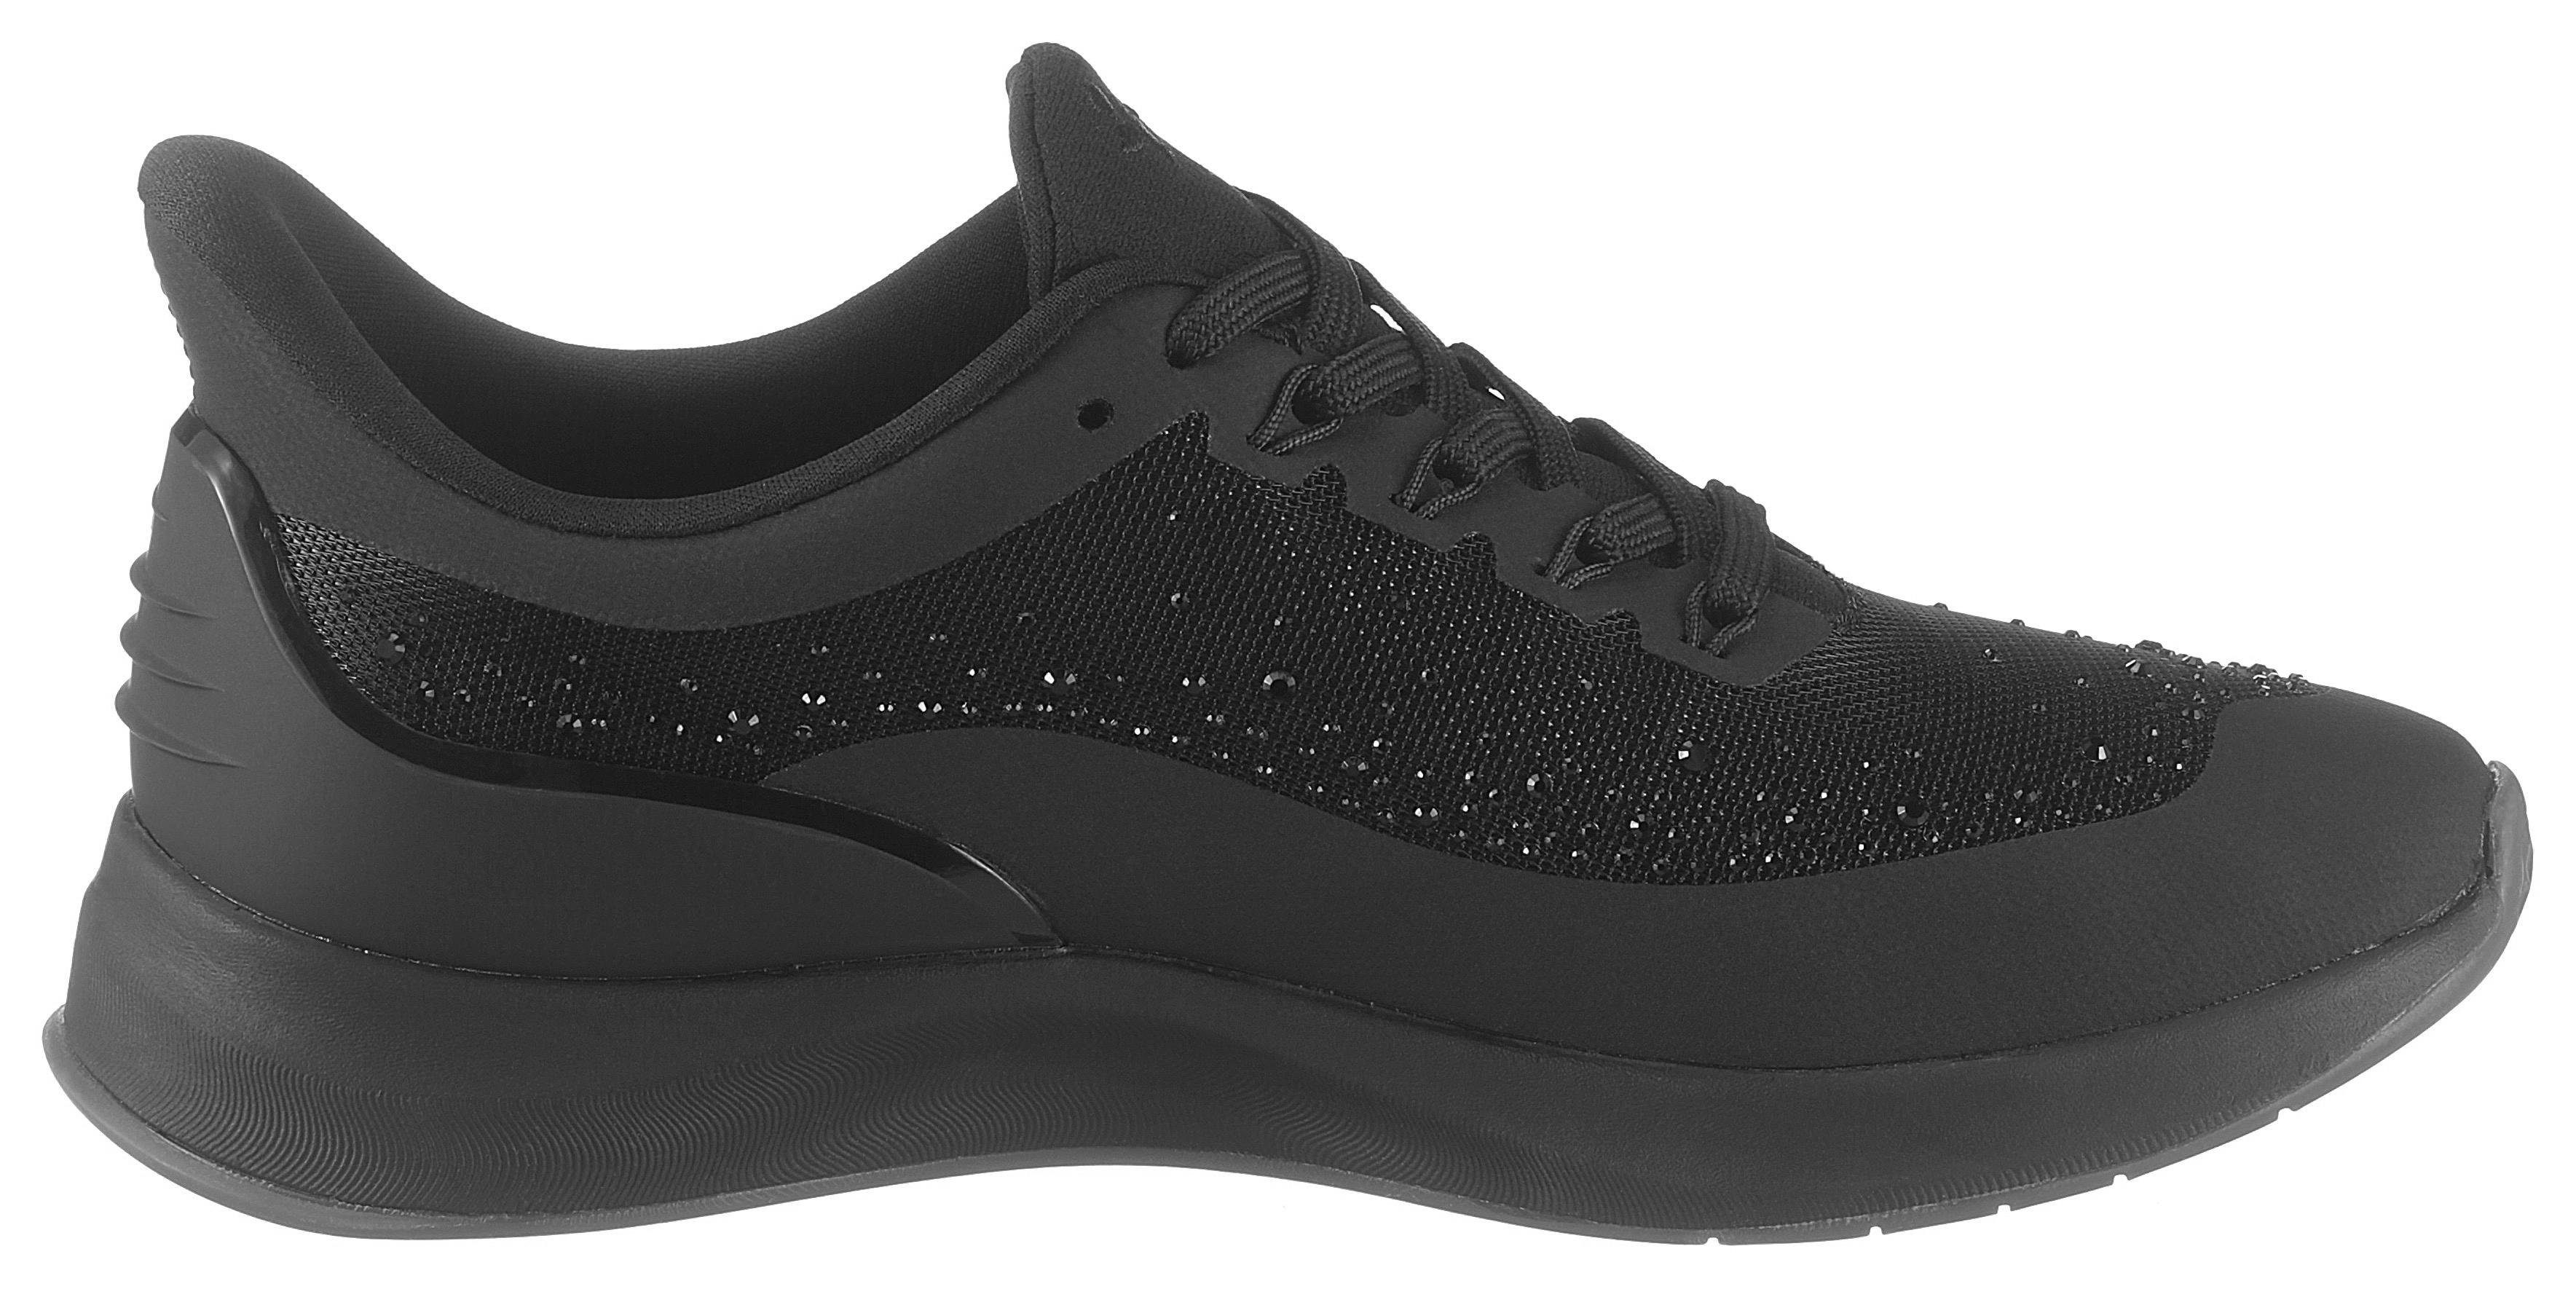 Tamaris Sneakers Fashletics Snel Online Gekocht - Geweldige Prijs